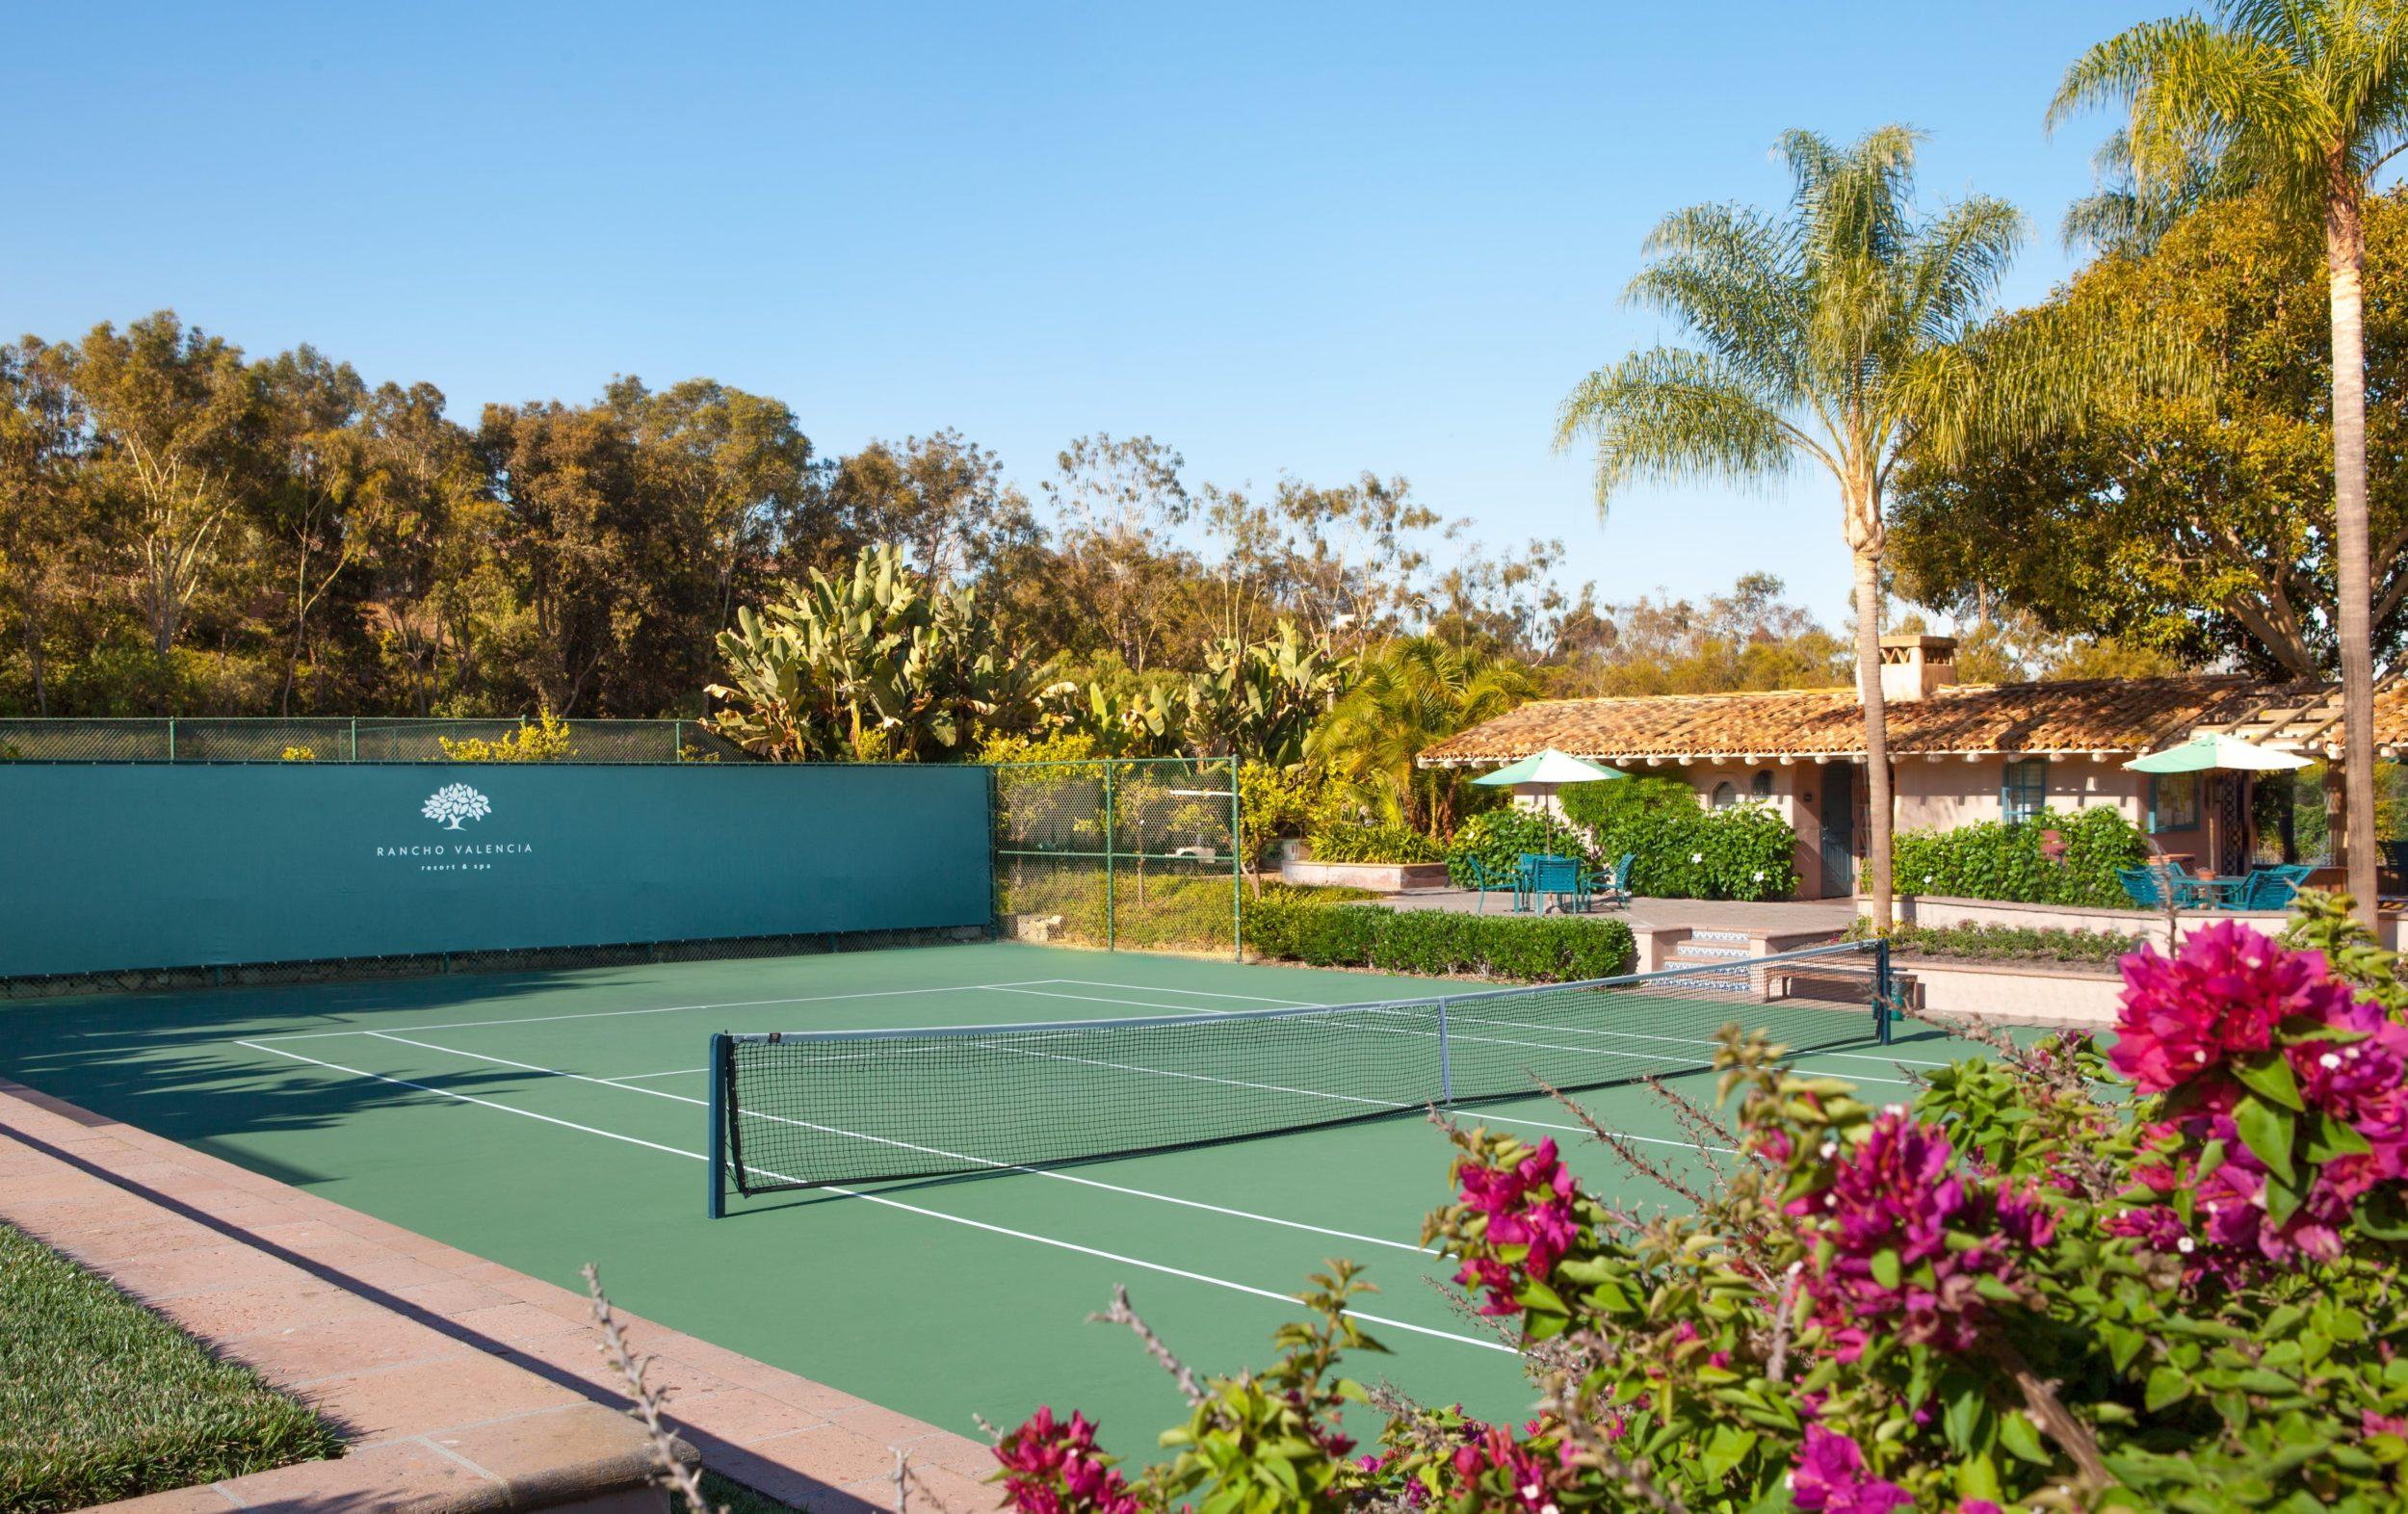 rancho valencia san diego tennis